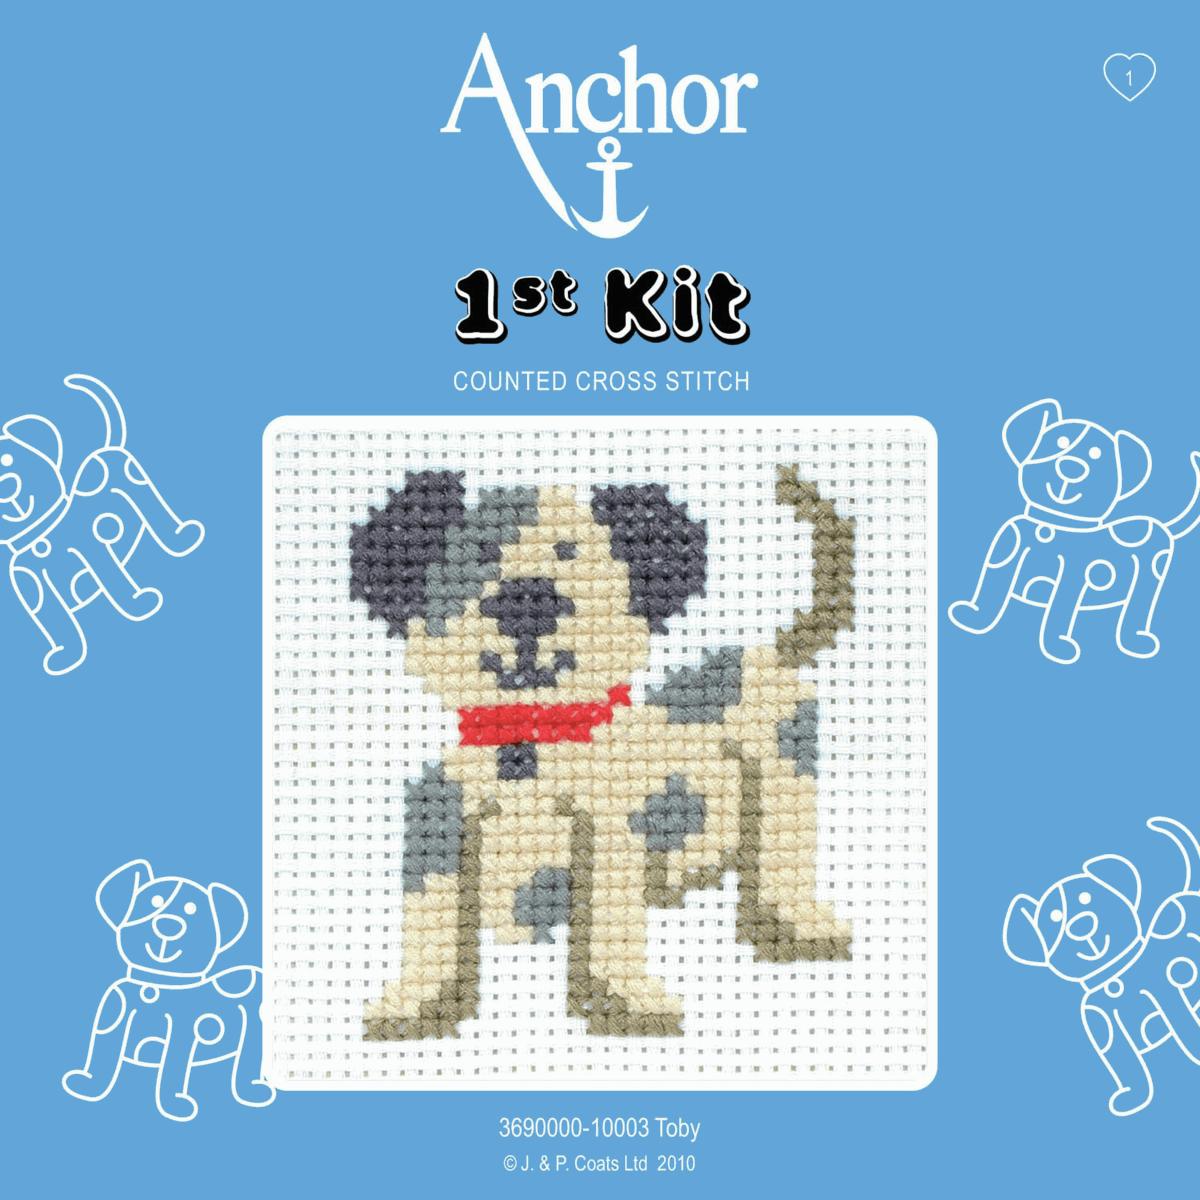 1st Cross Stitch Kit by Anchor - Toby Dog